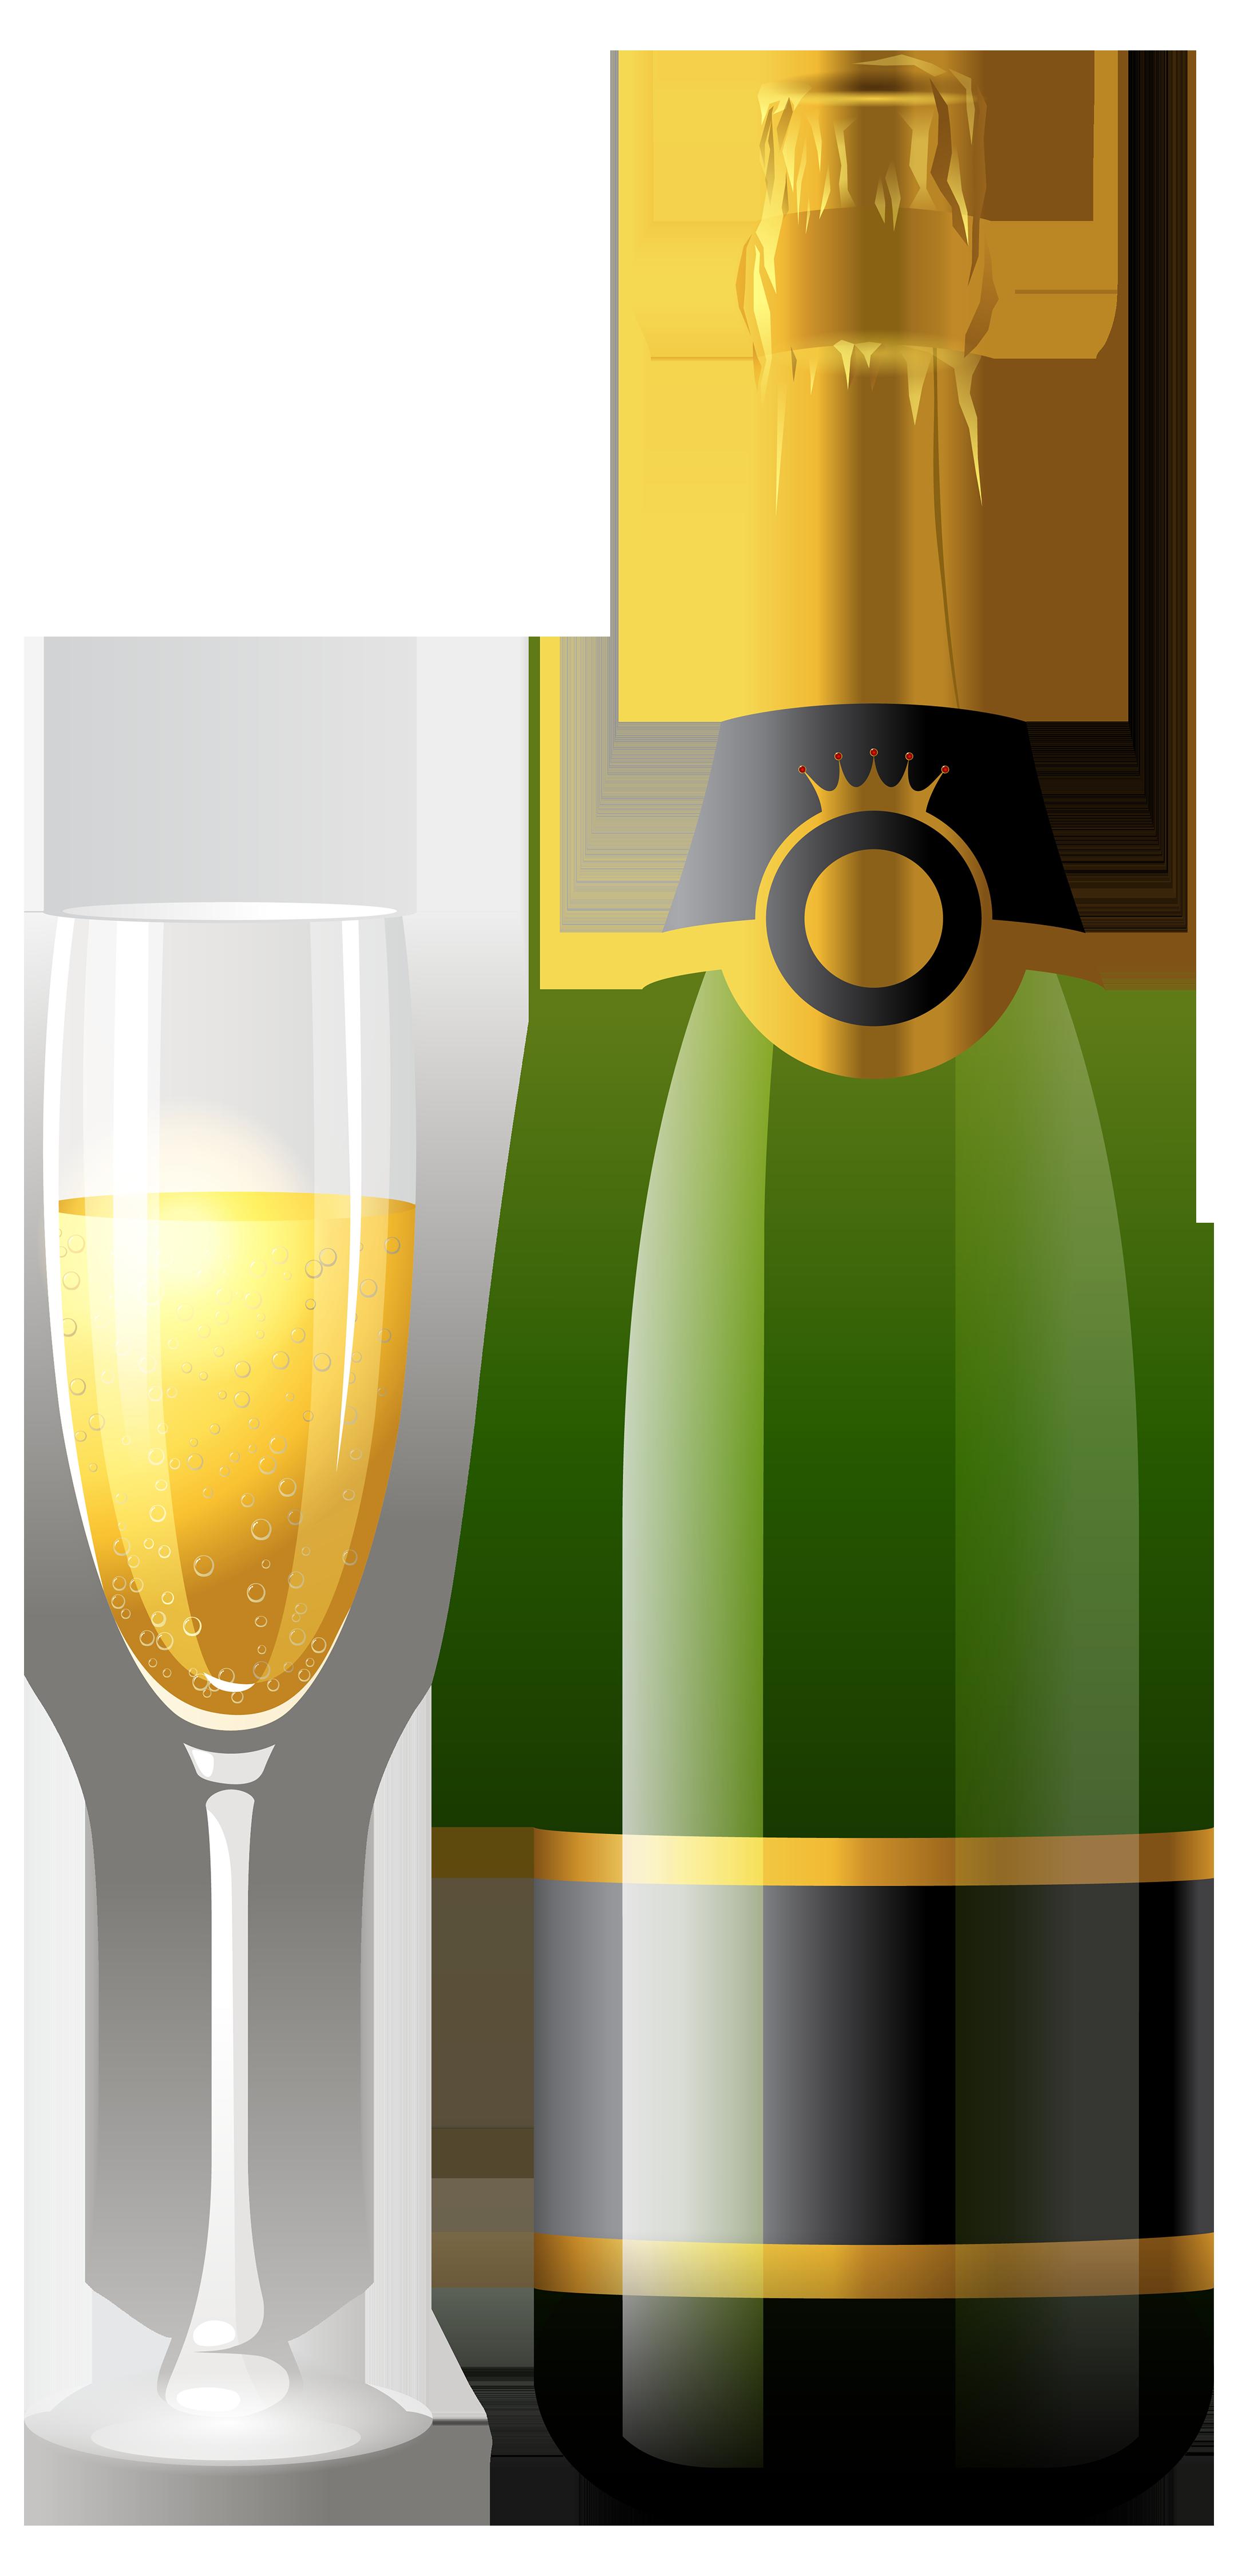 Maid clipart beer. Champagne bottle glasses szukaj